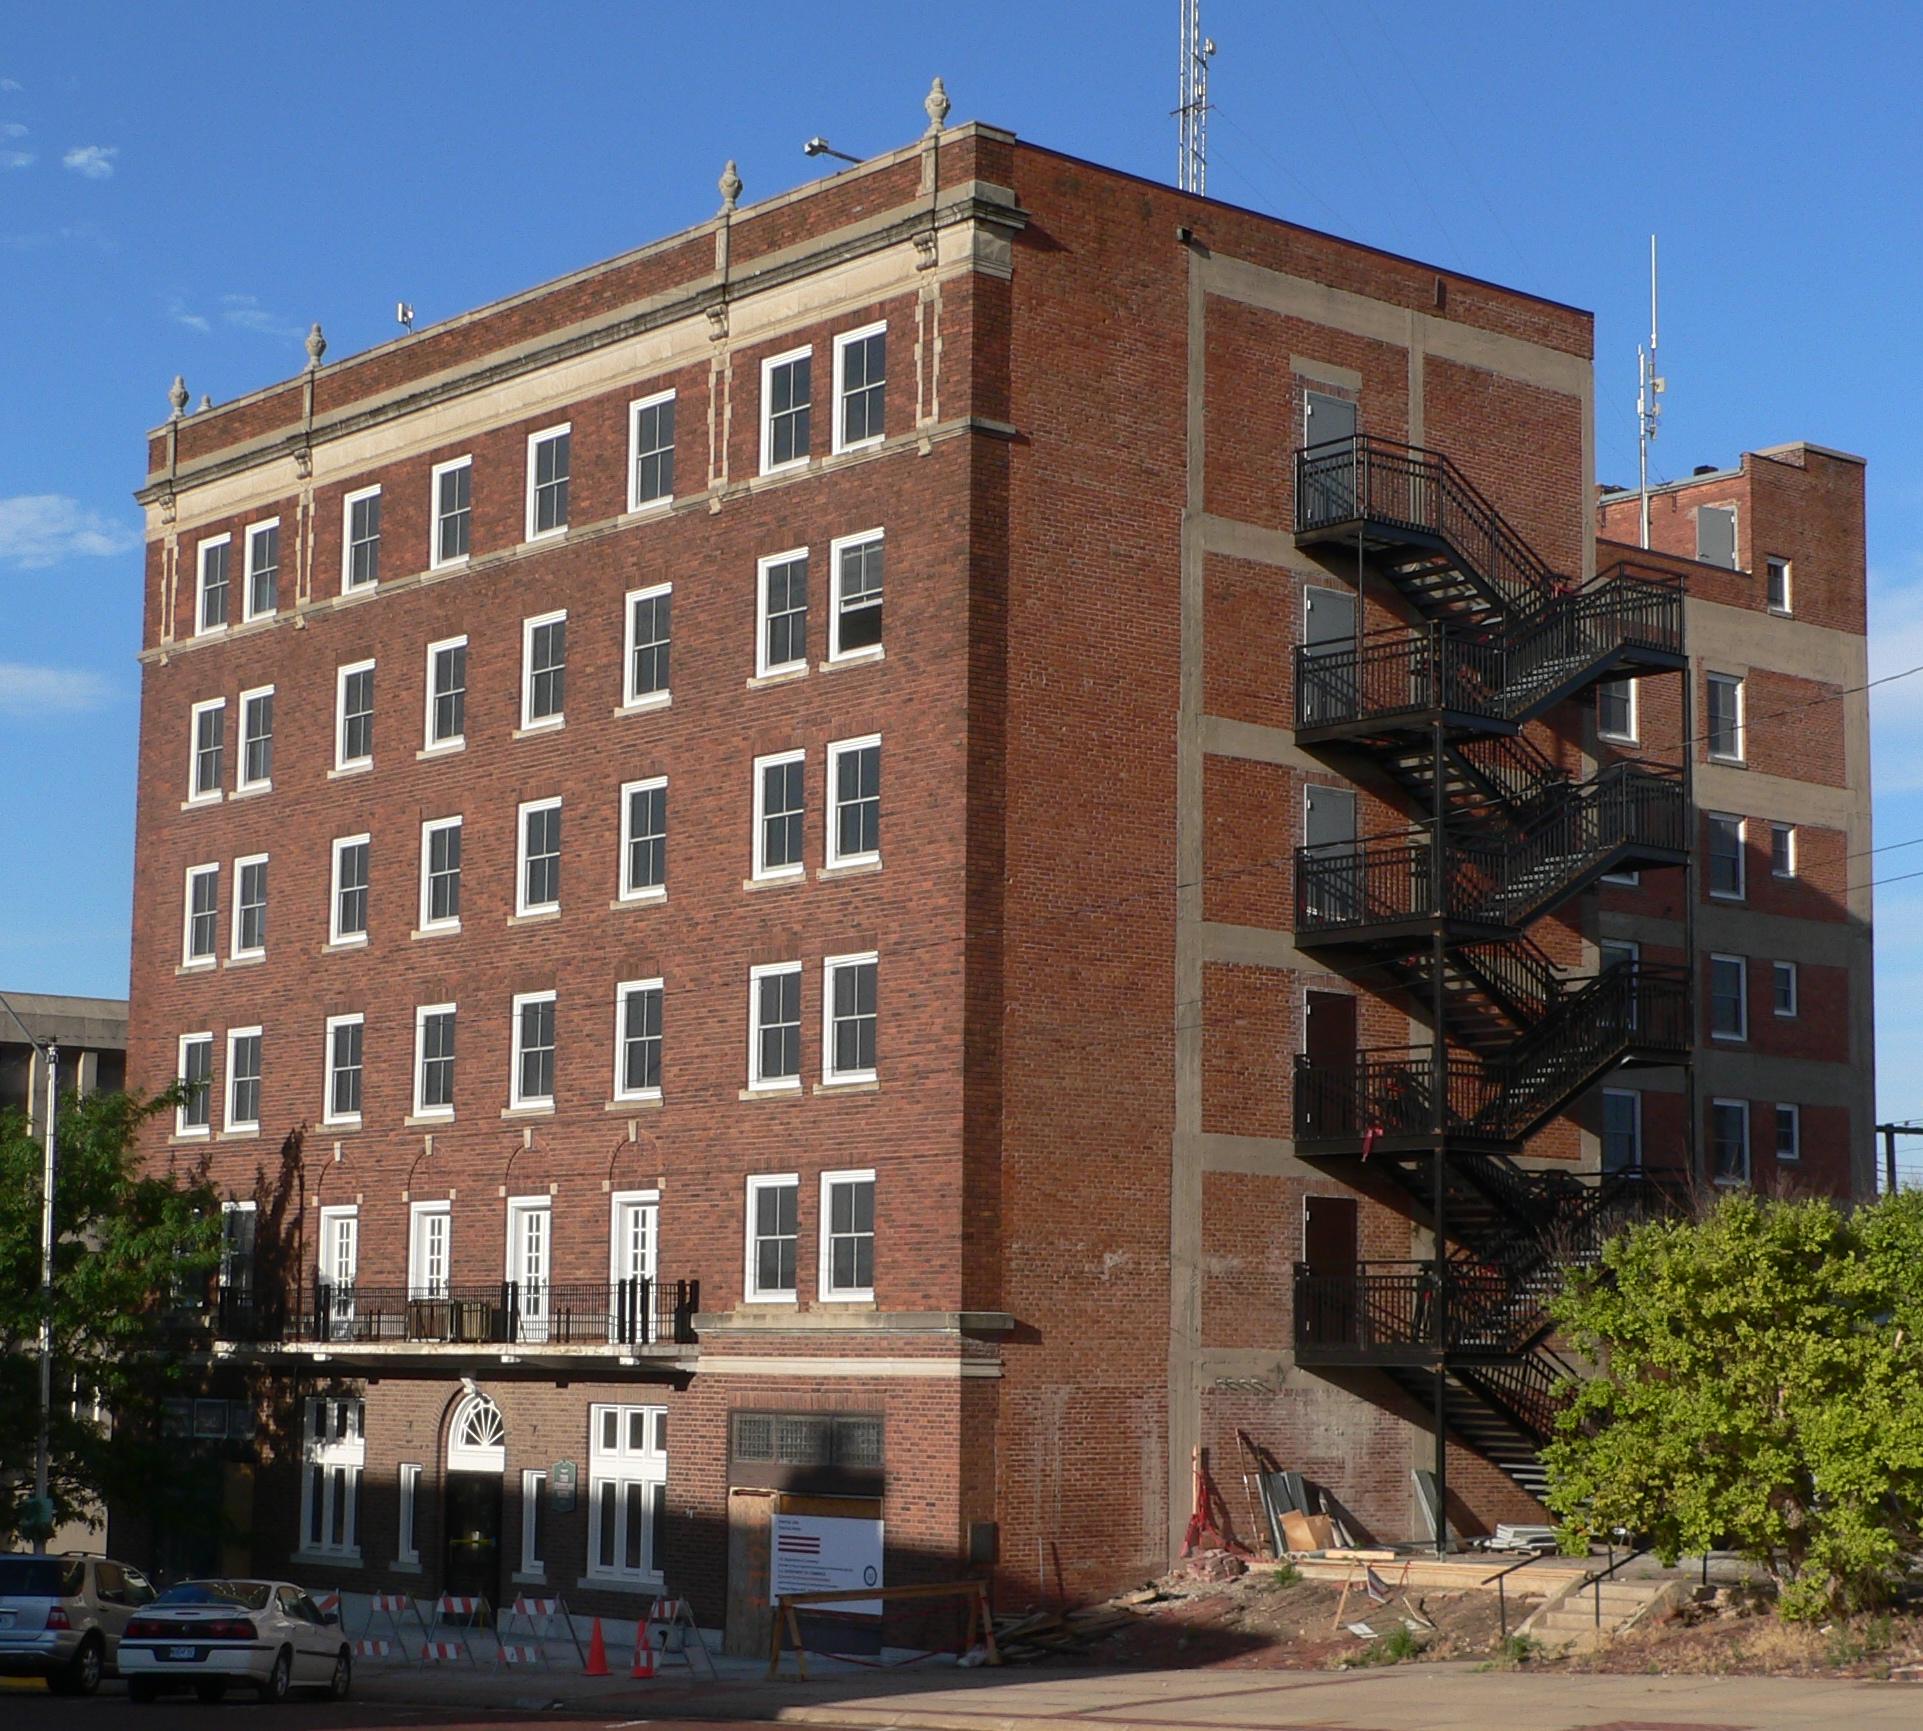 File Keystone Hotel Mccook Nebraska From Ne 1 Jpg